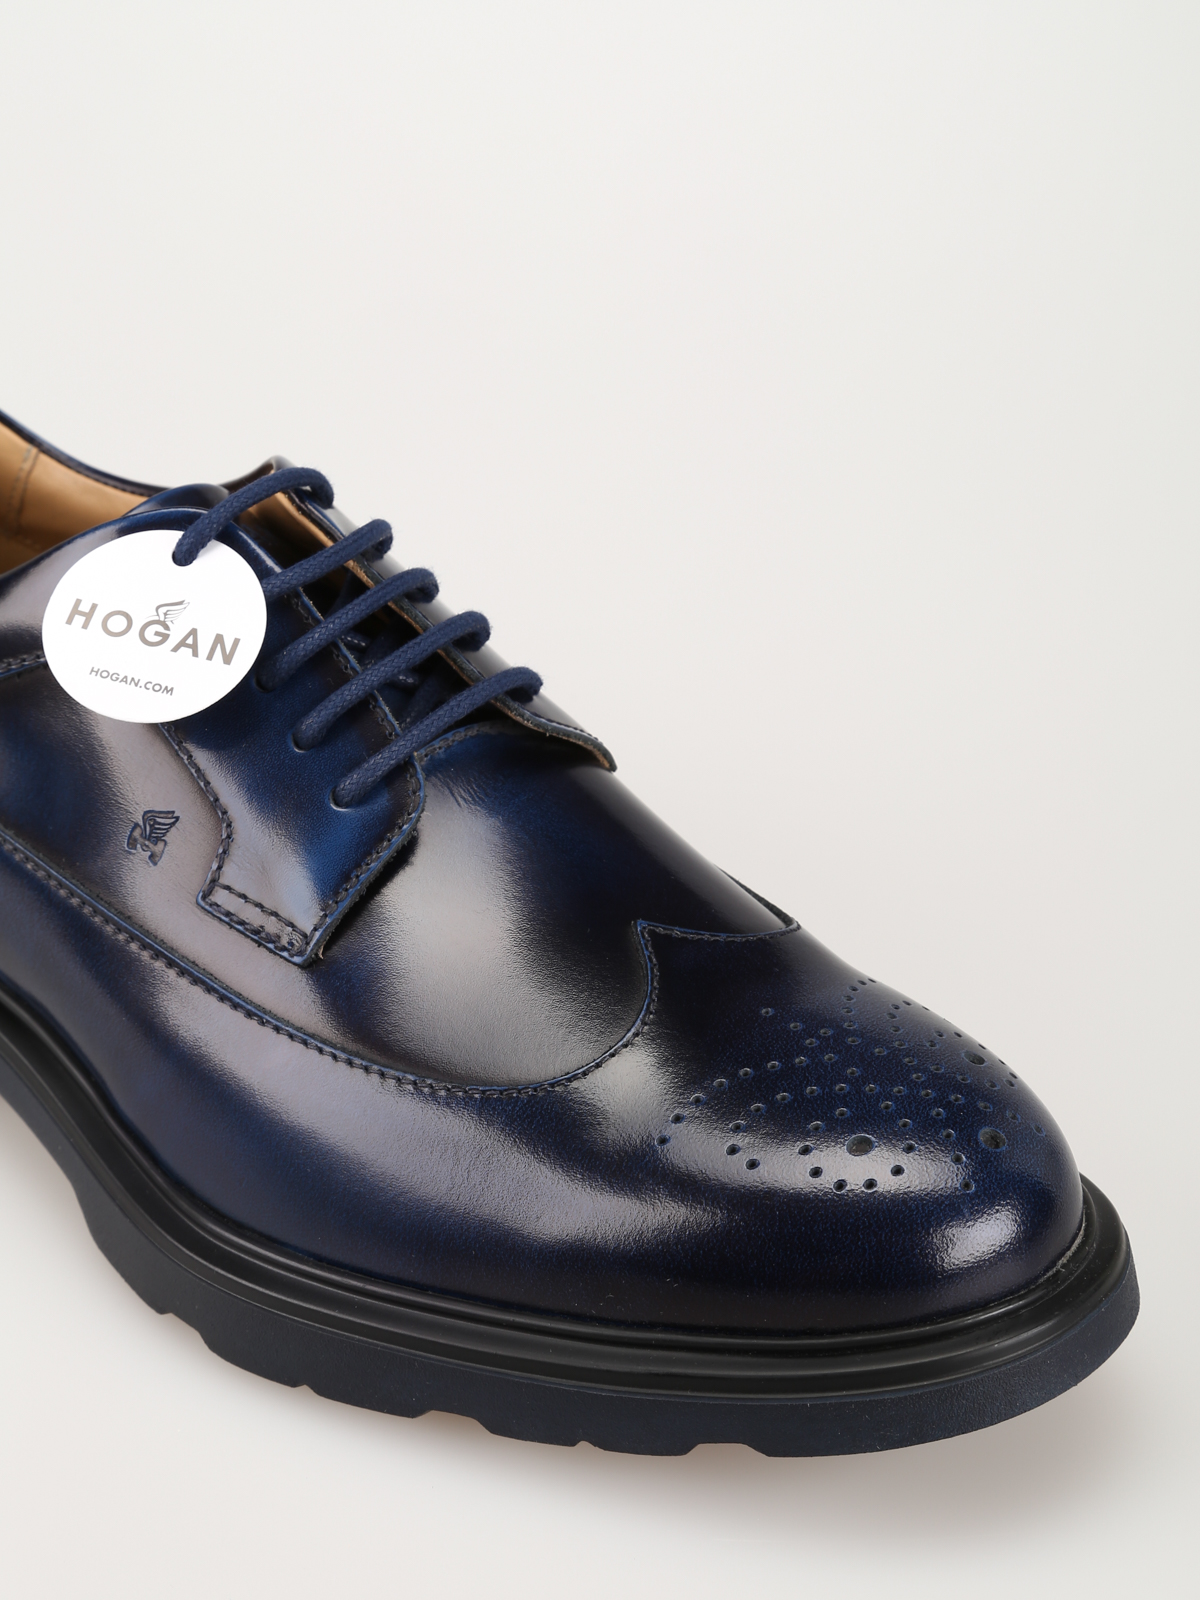 Scarpe stringate Hogan - Derby H304 in pelle blu sfumata ...